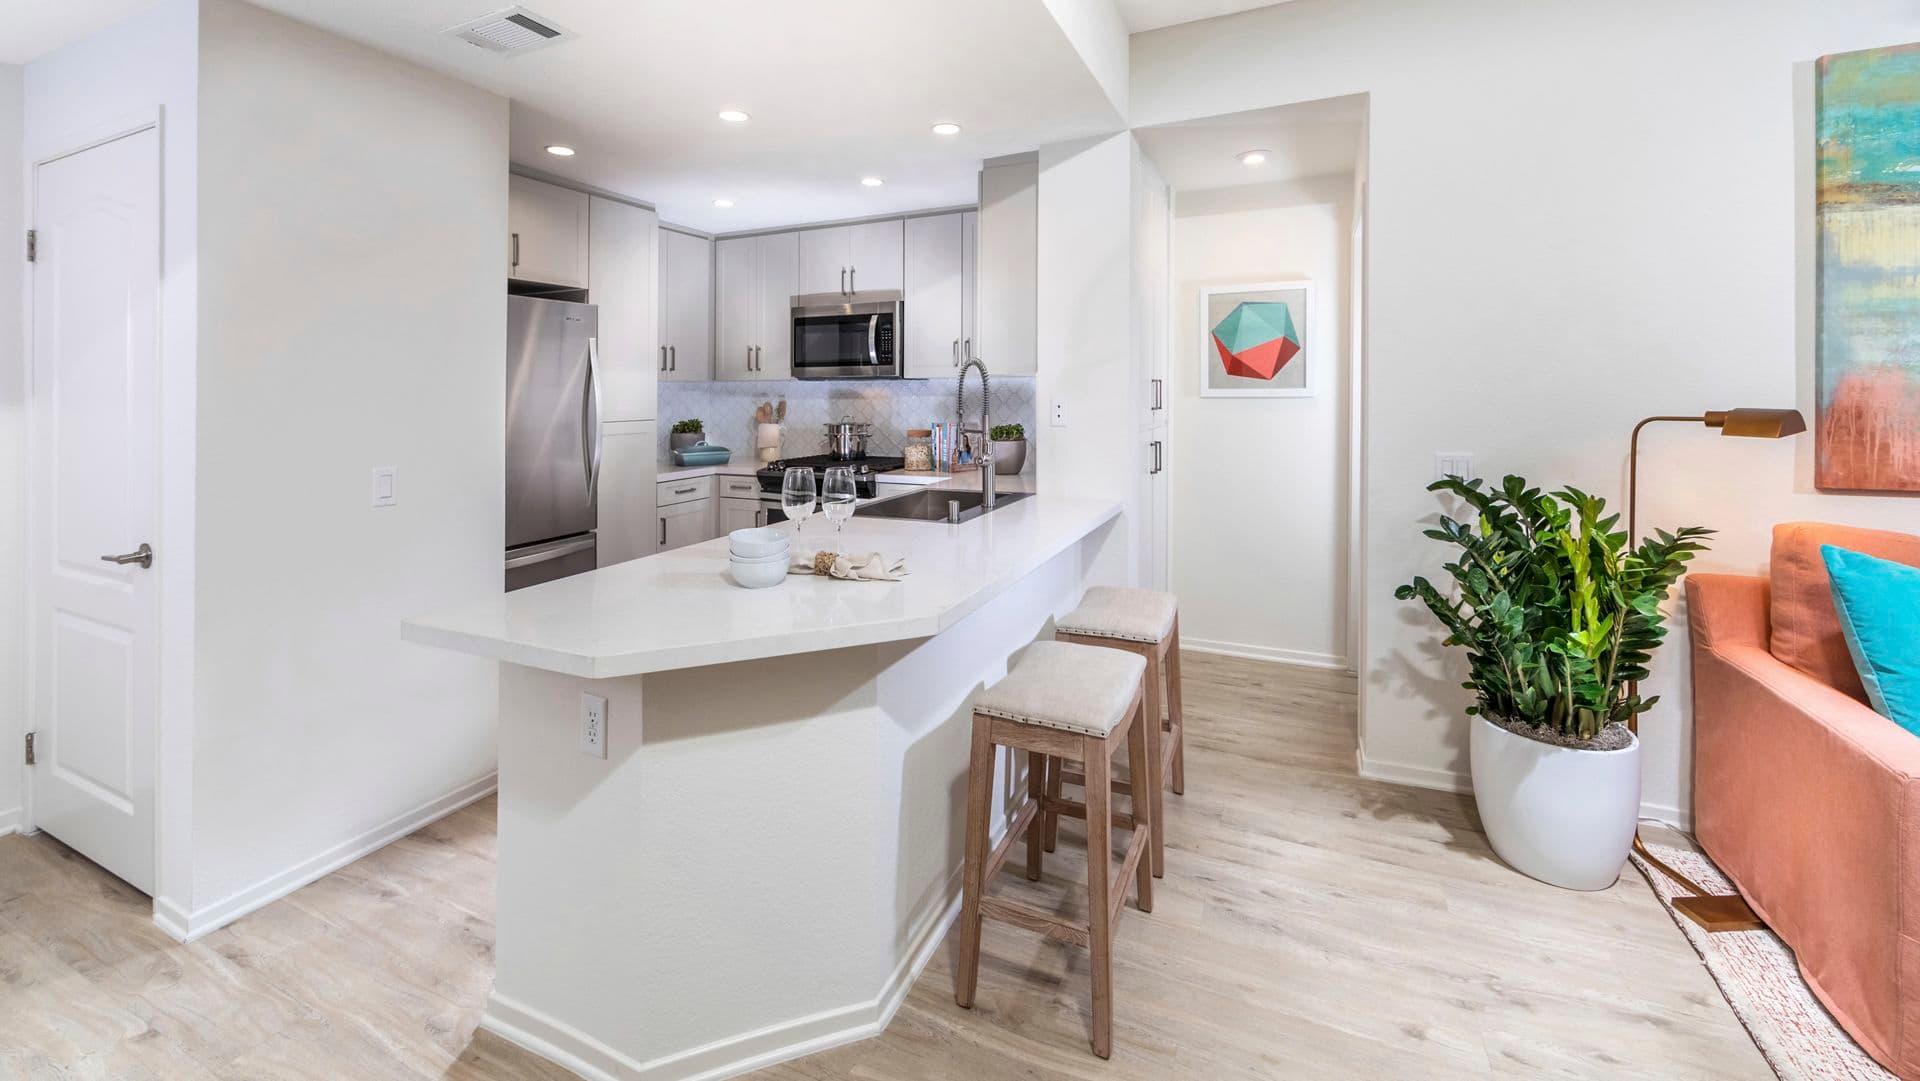 Interior view of kitchen at Newport Ridge Apartment Homes in Newport Beach, CA.